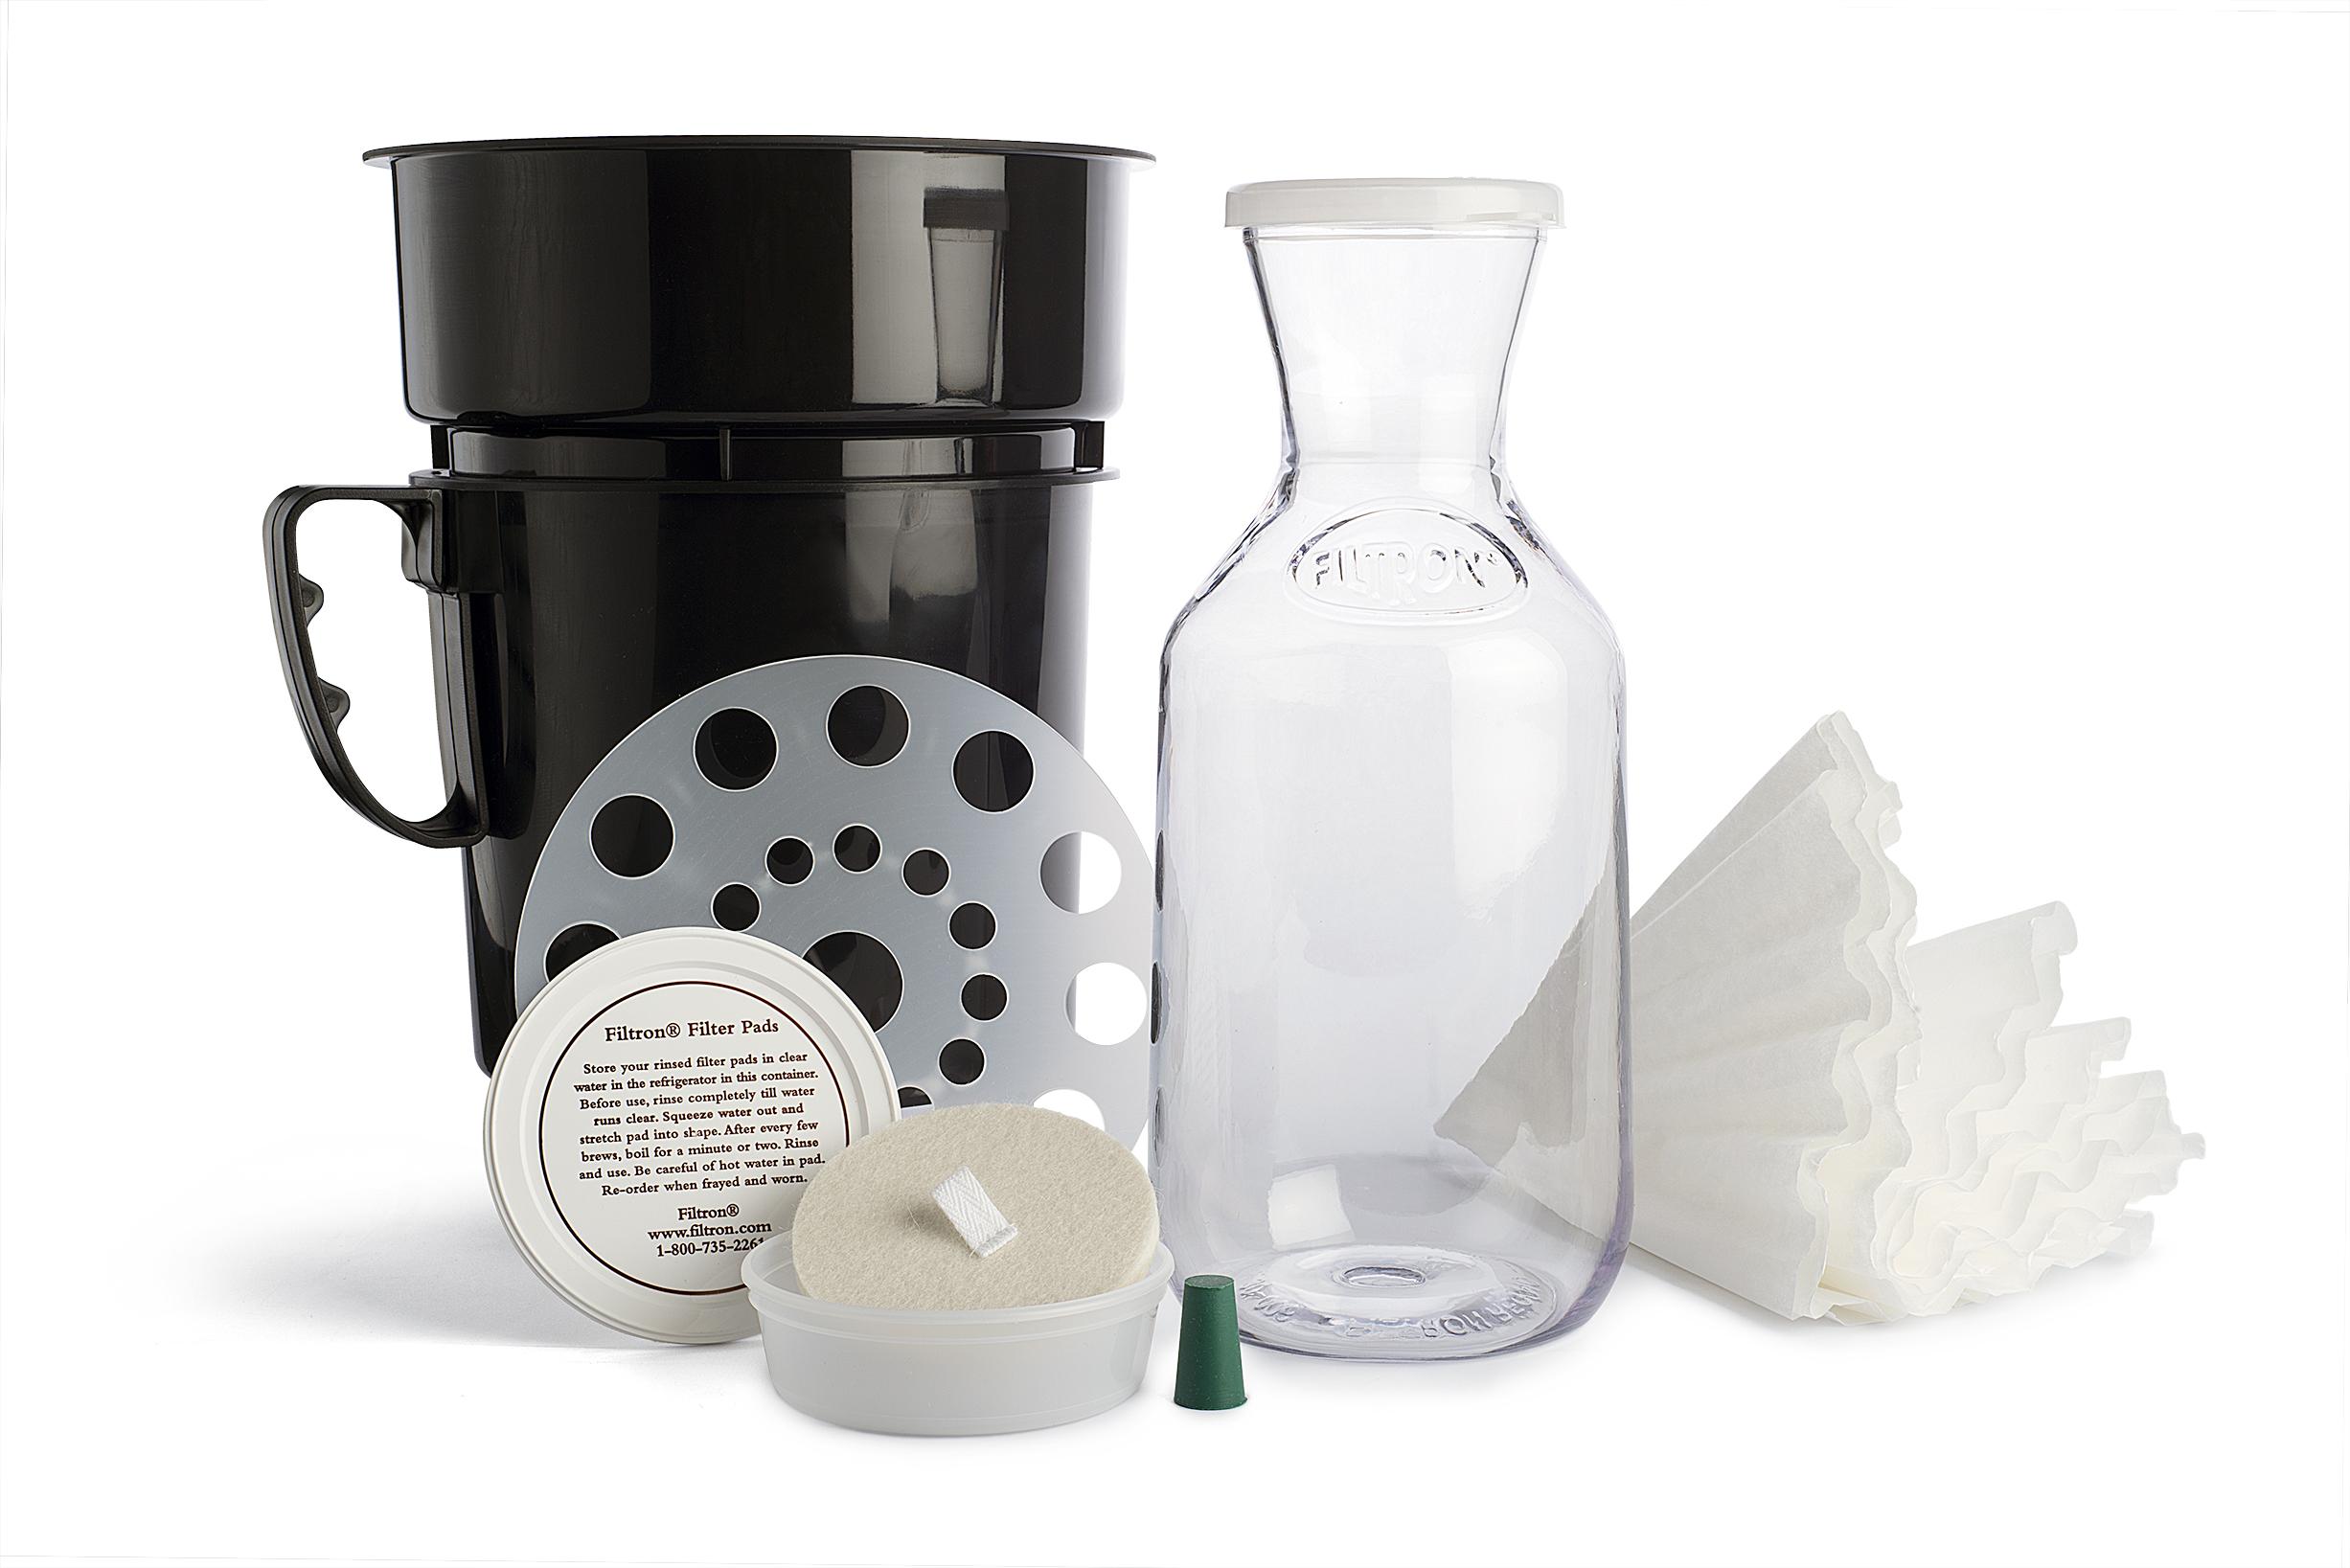 kona coffee brewing instructions